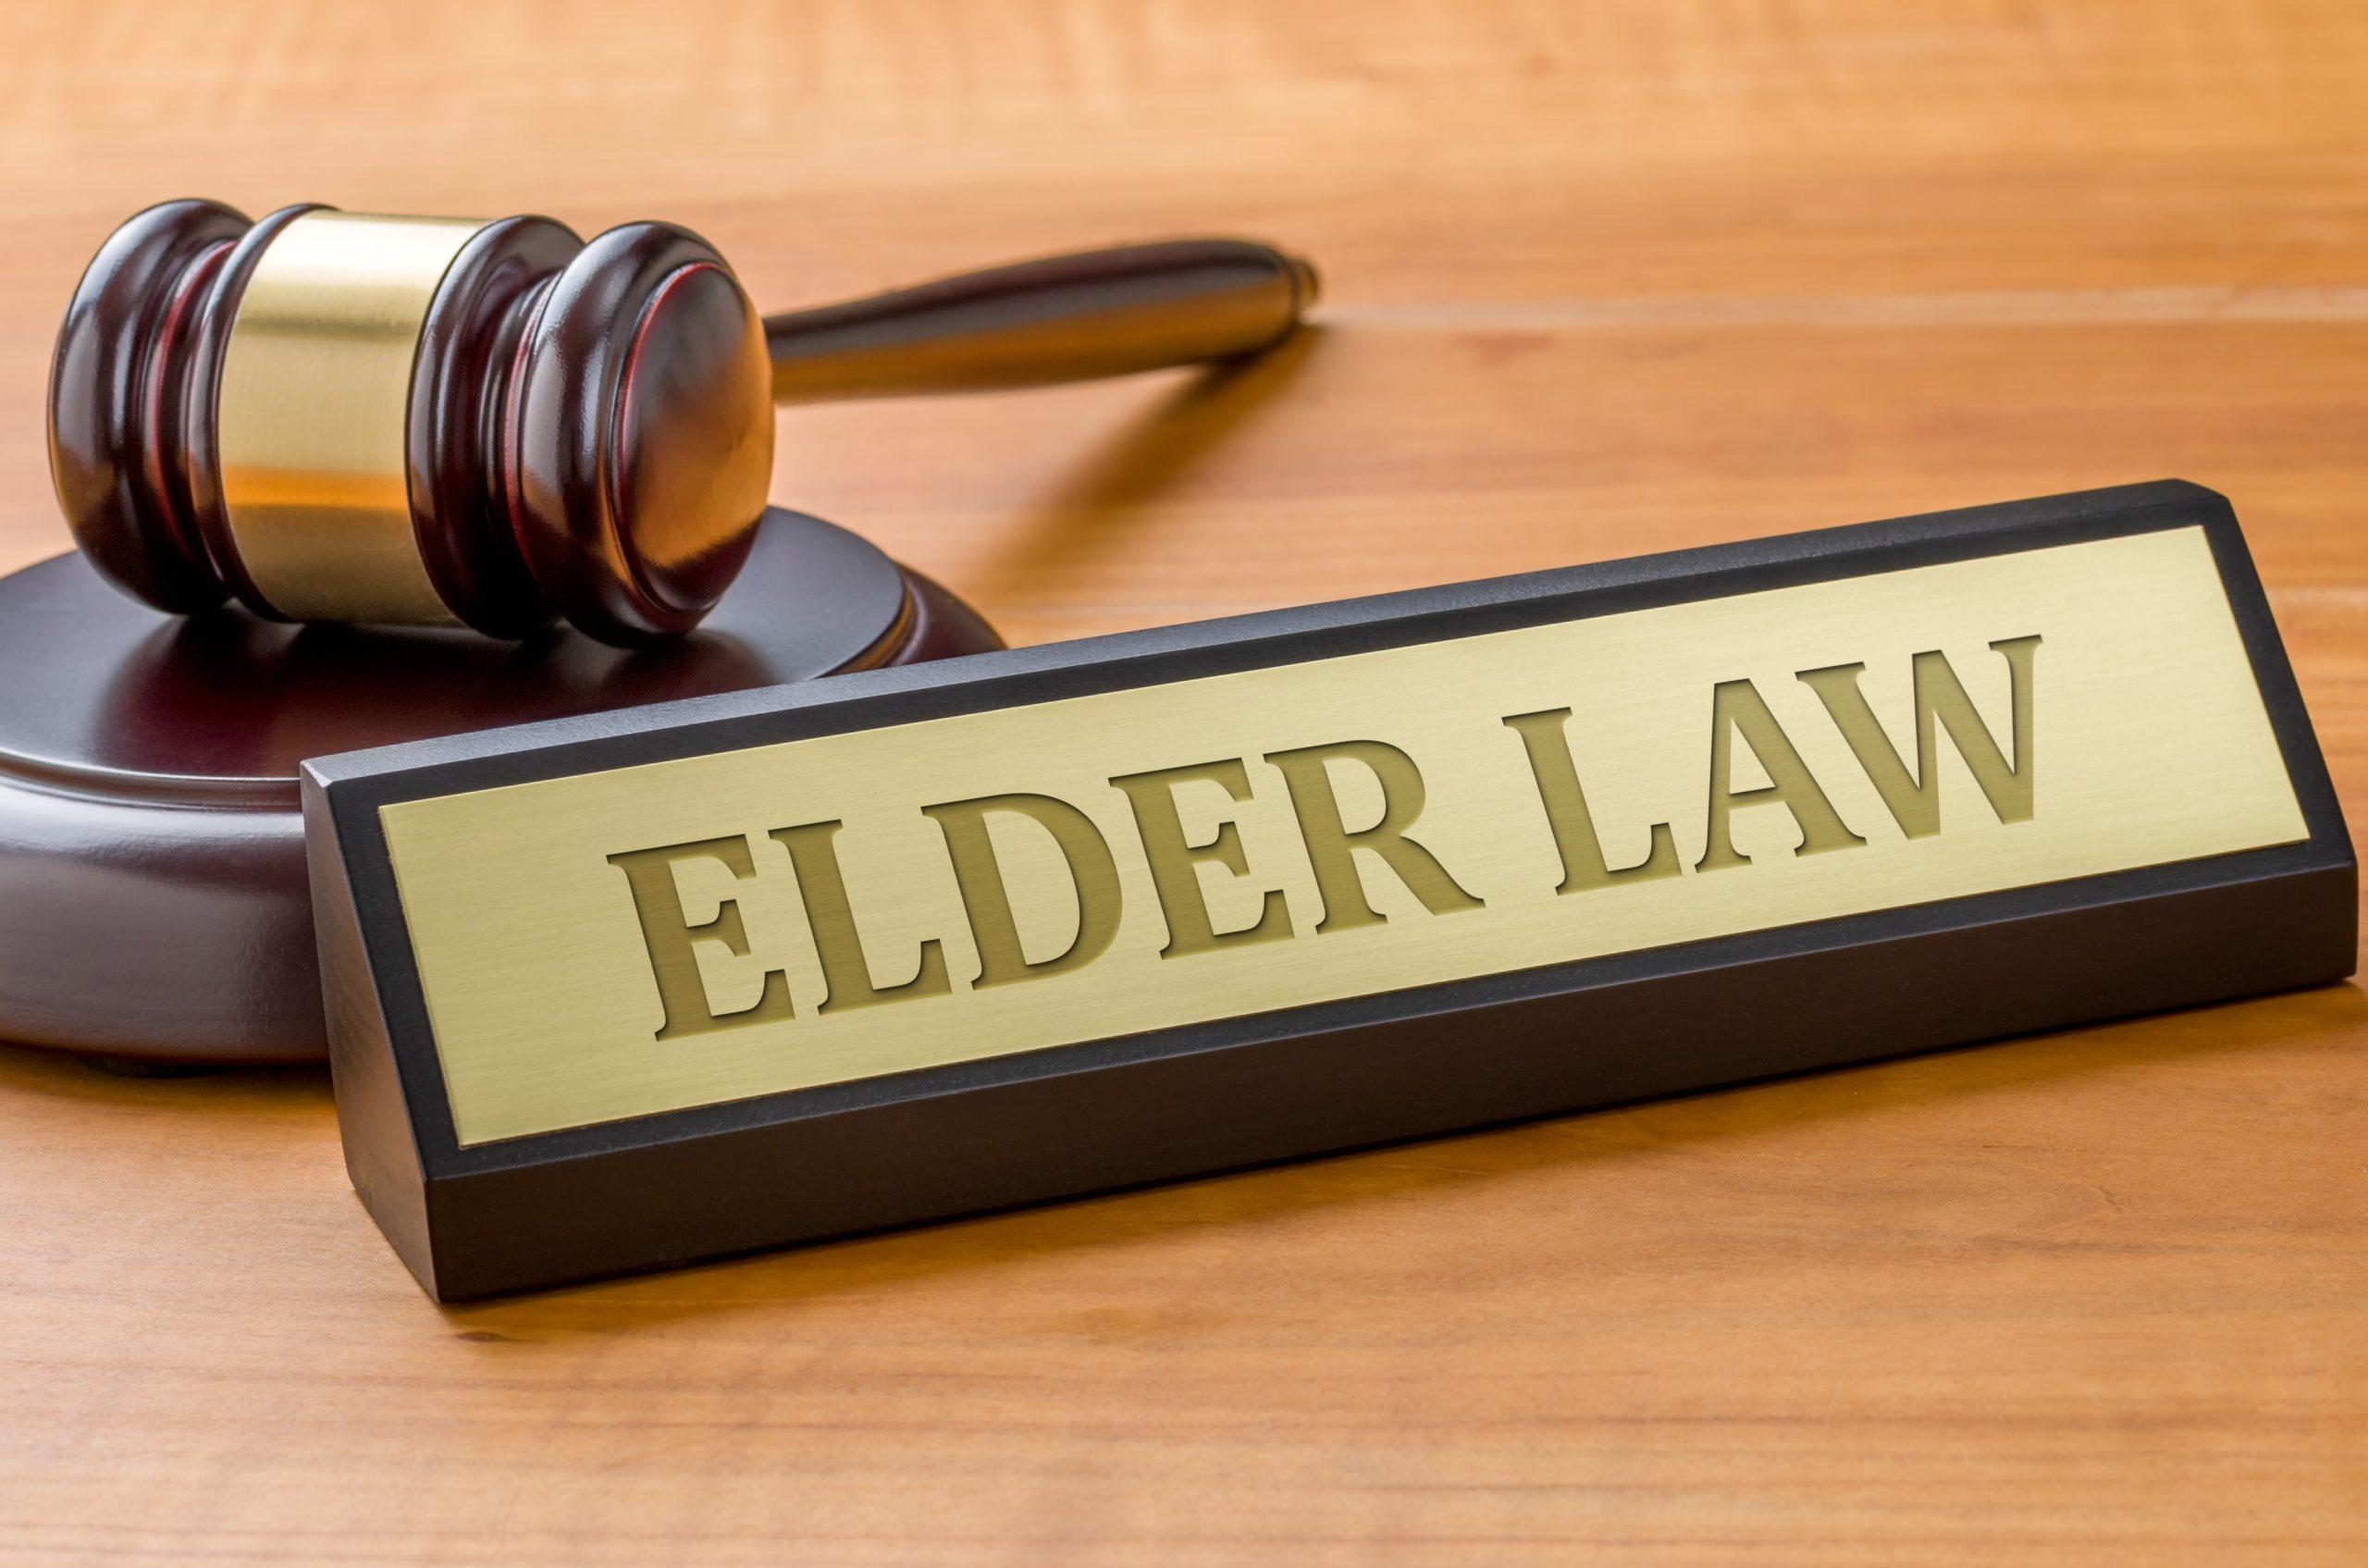 Elder law - California Attorneys